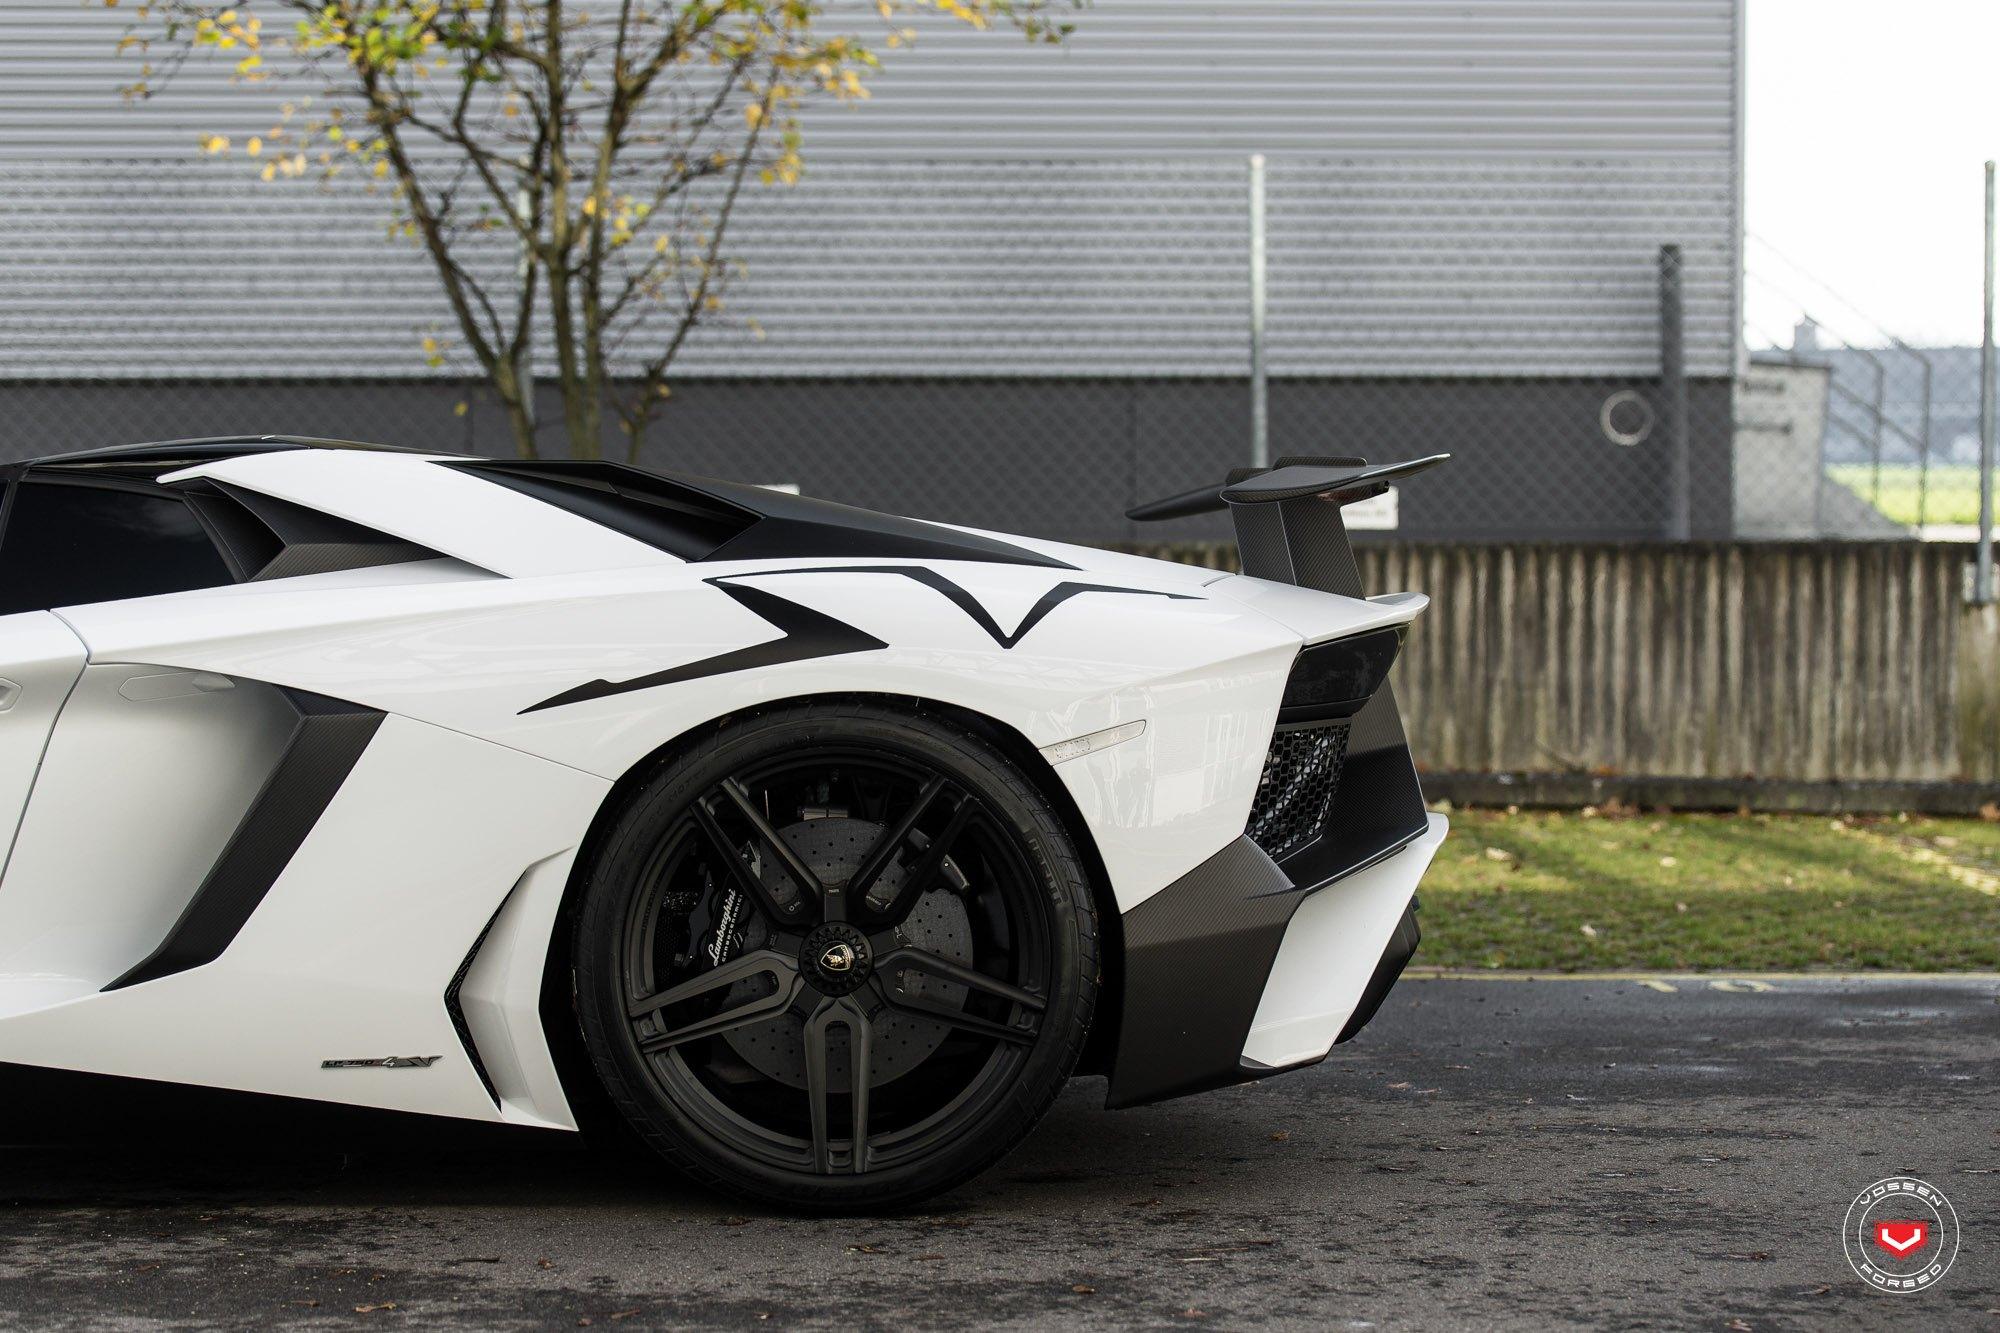 Black And White Exterior Color Solution For Custom Lamborghini